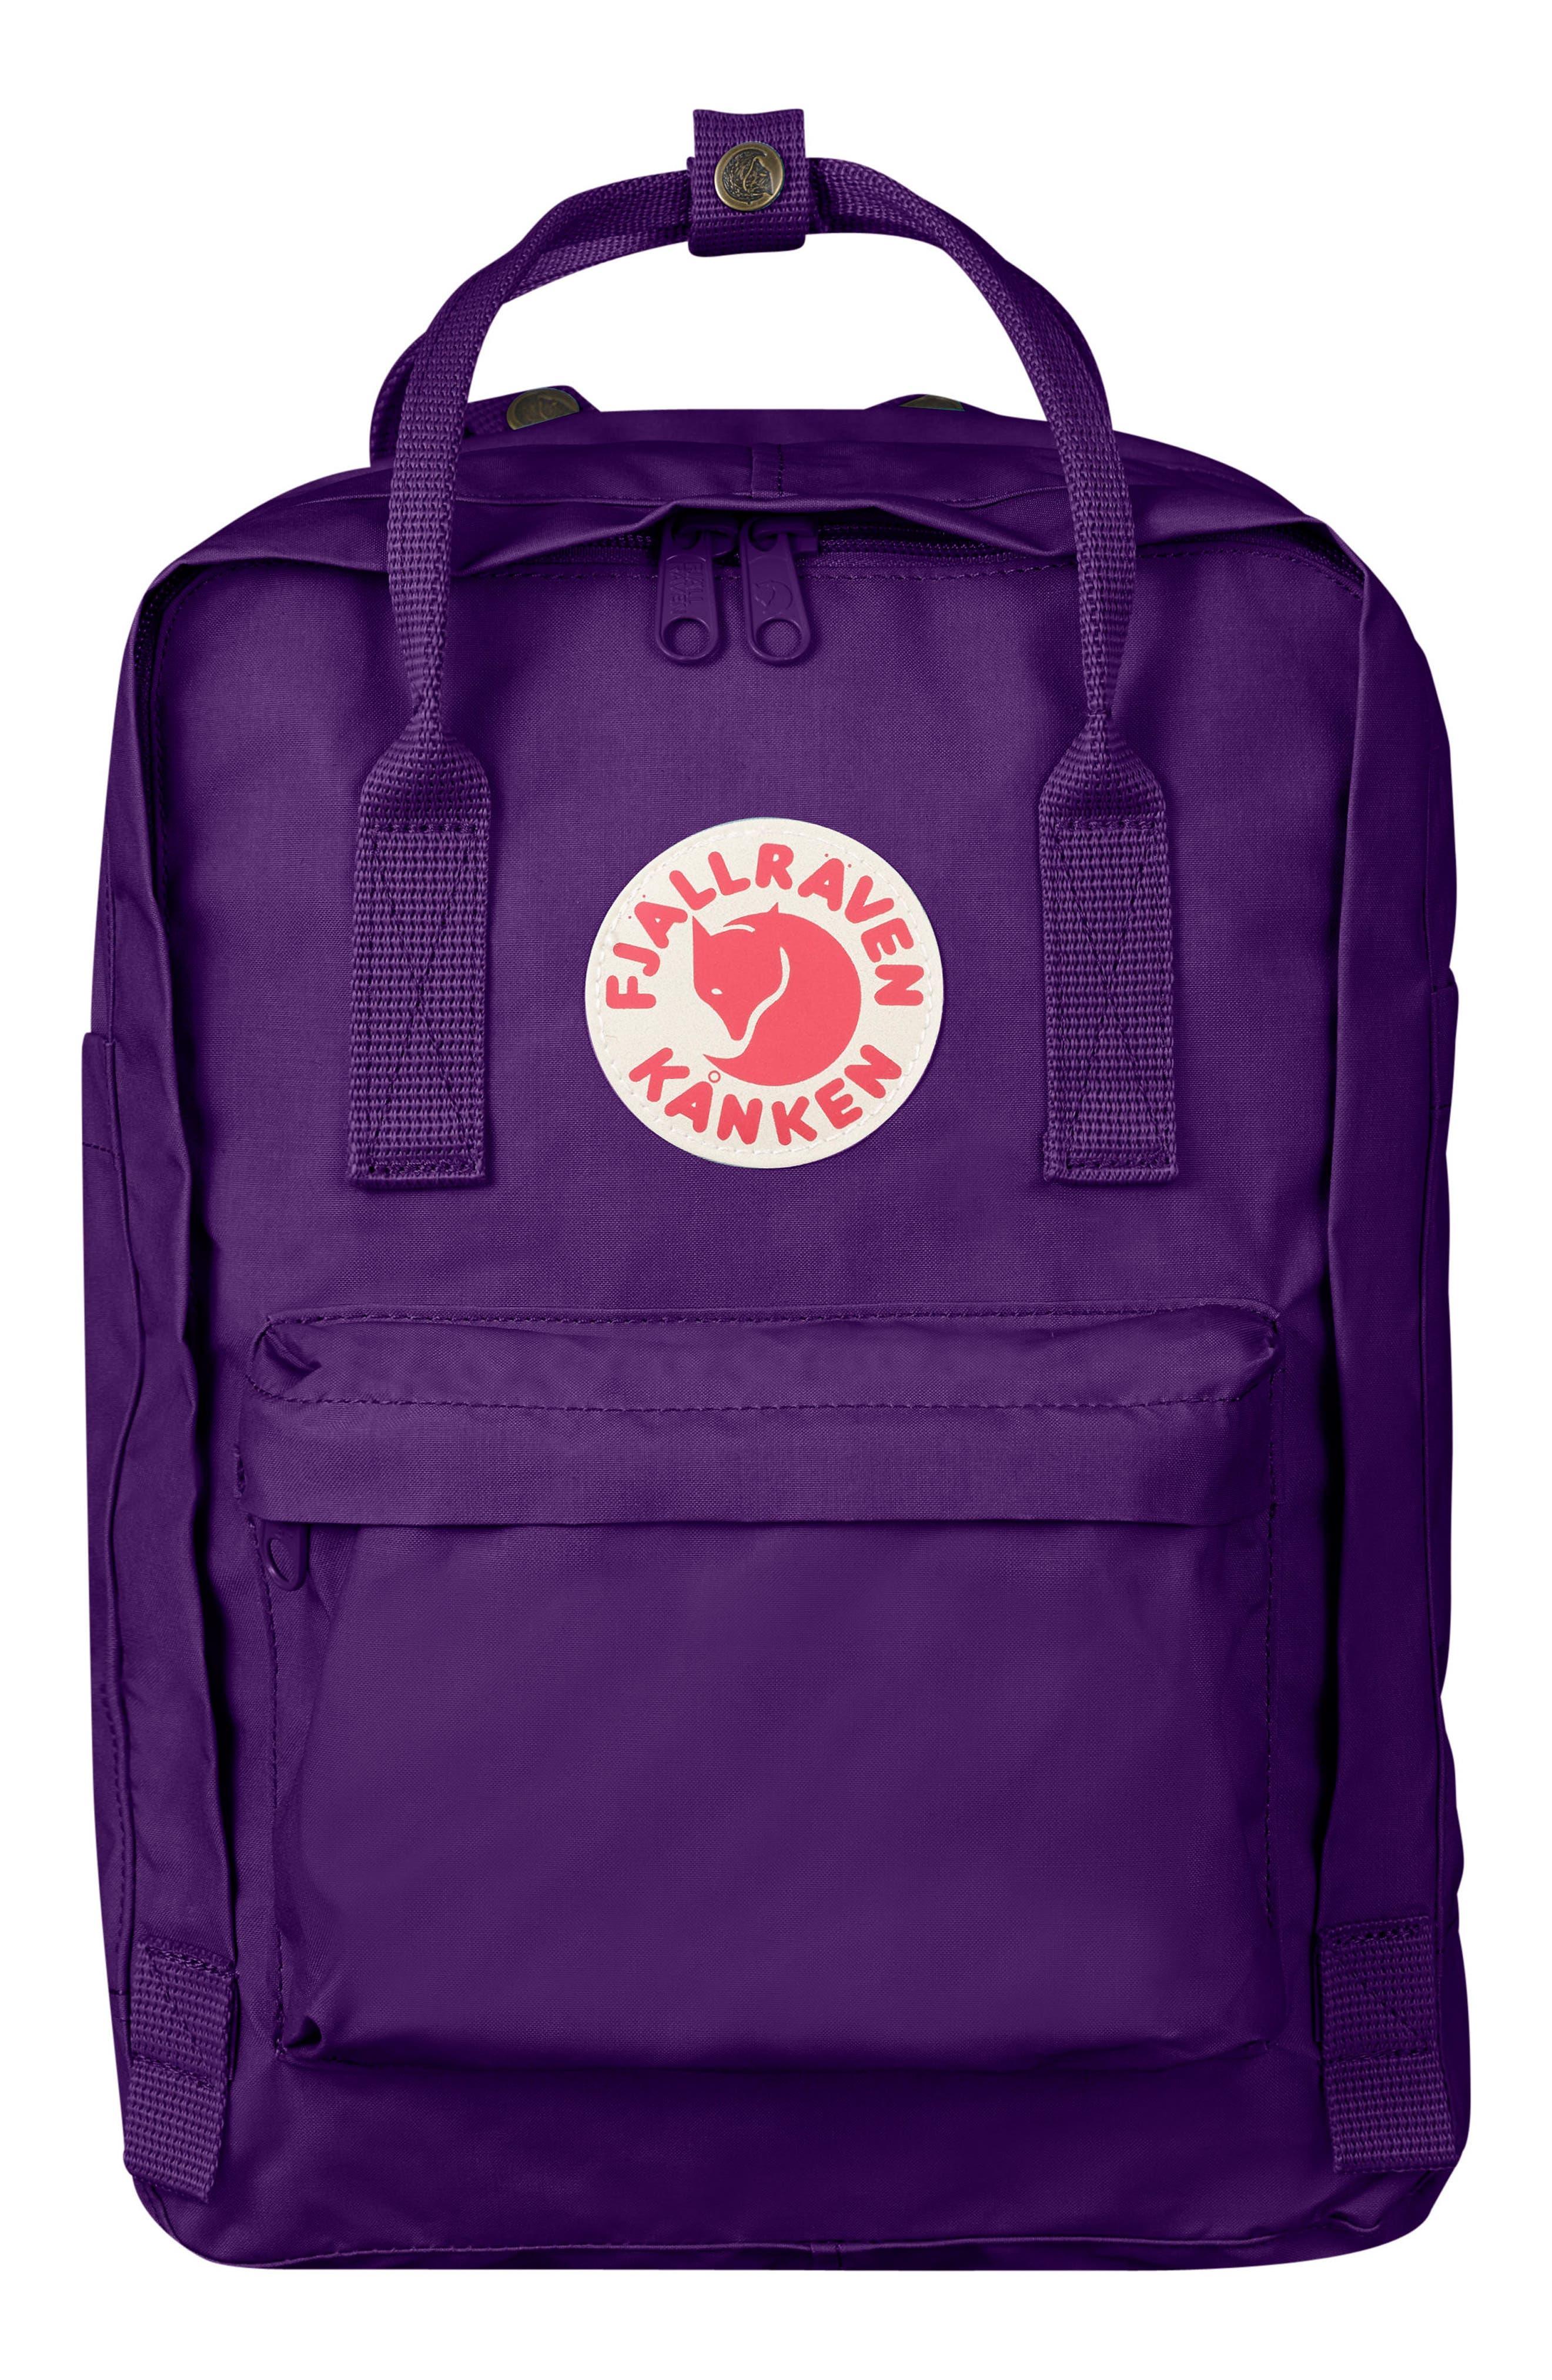 FJÄLLRÄVEN 'Kånken' Laptop Backpack, Main, color, PURPLE